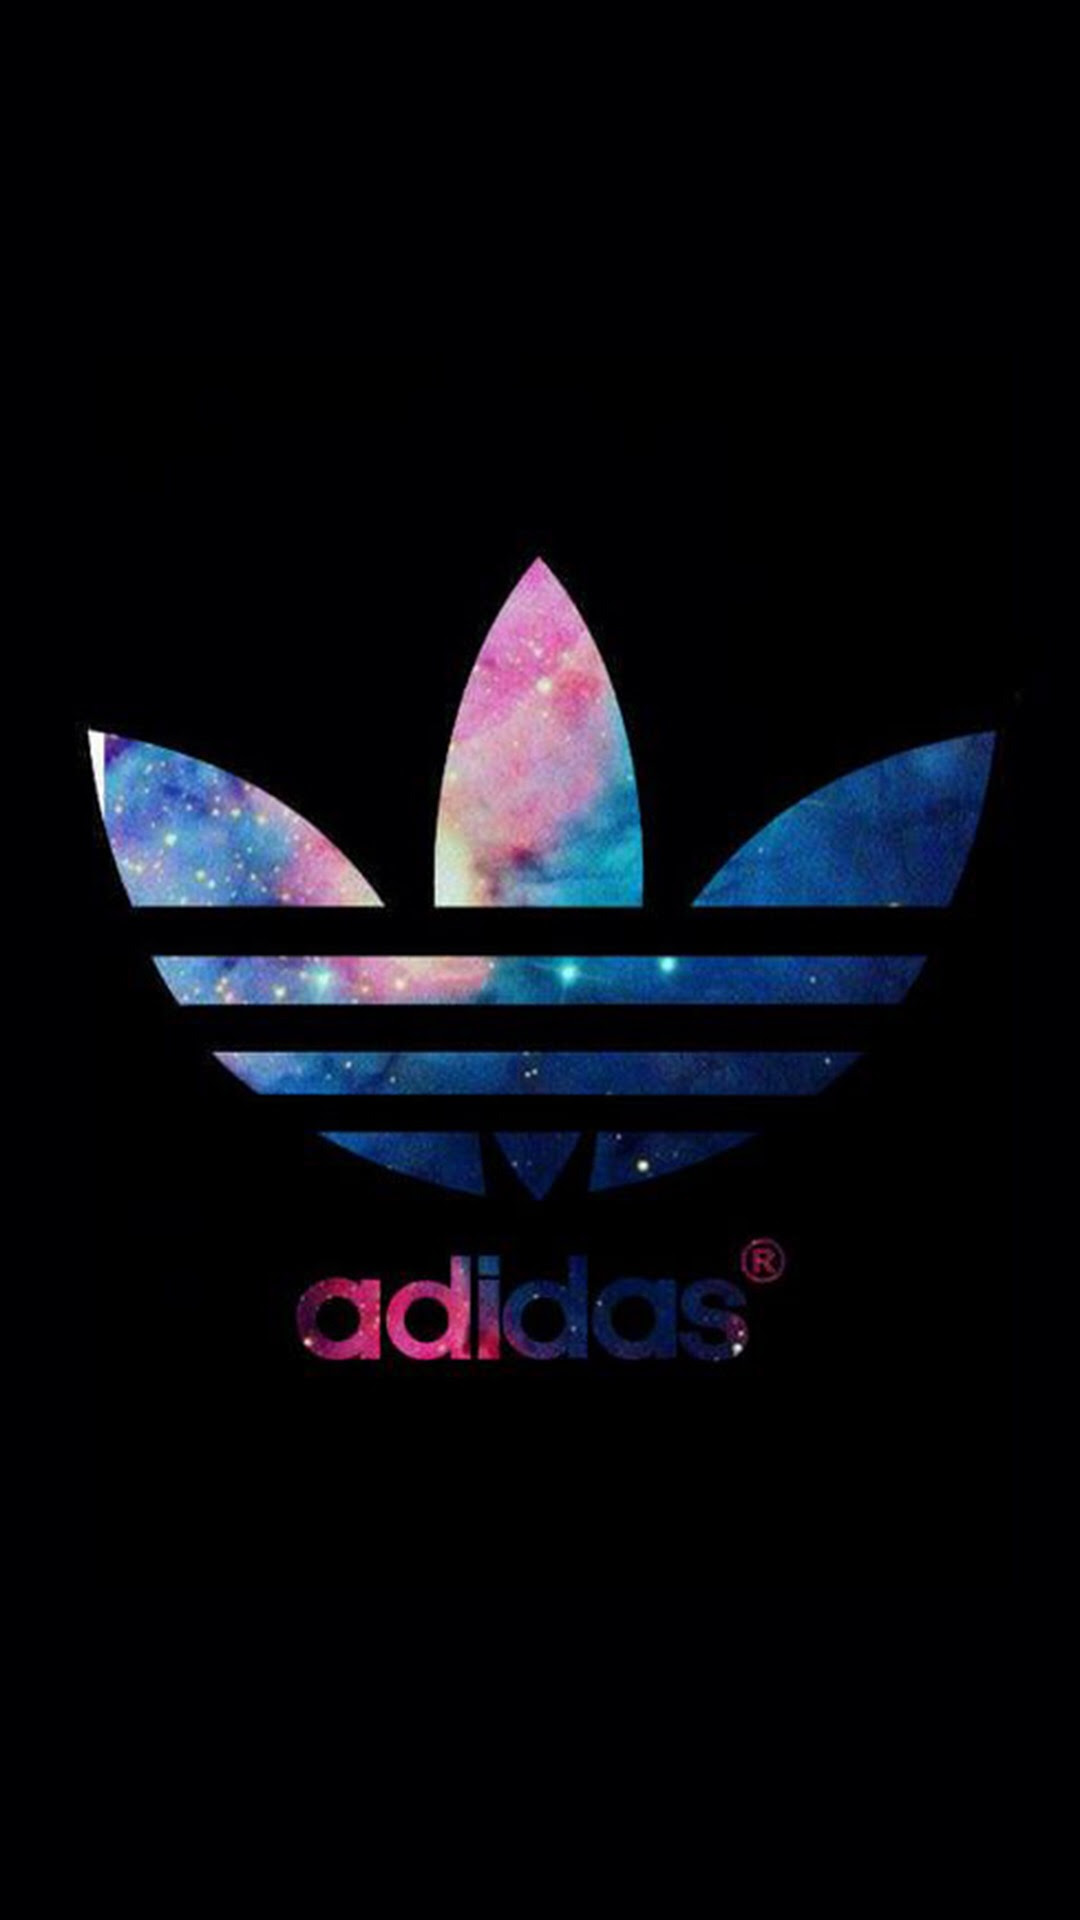 Adidas Originalsロゴ めちゃ人気 Iphone壁紙dj